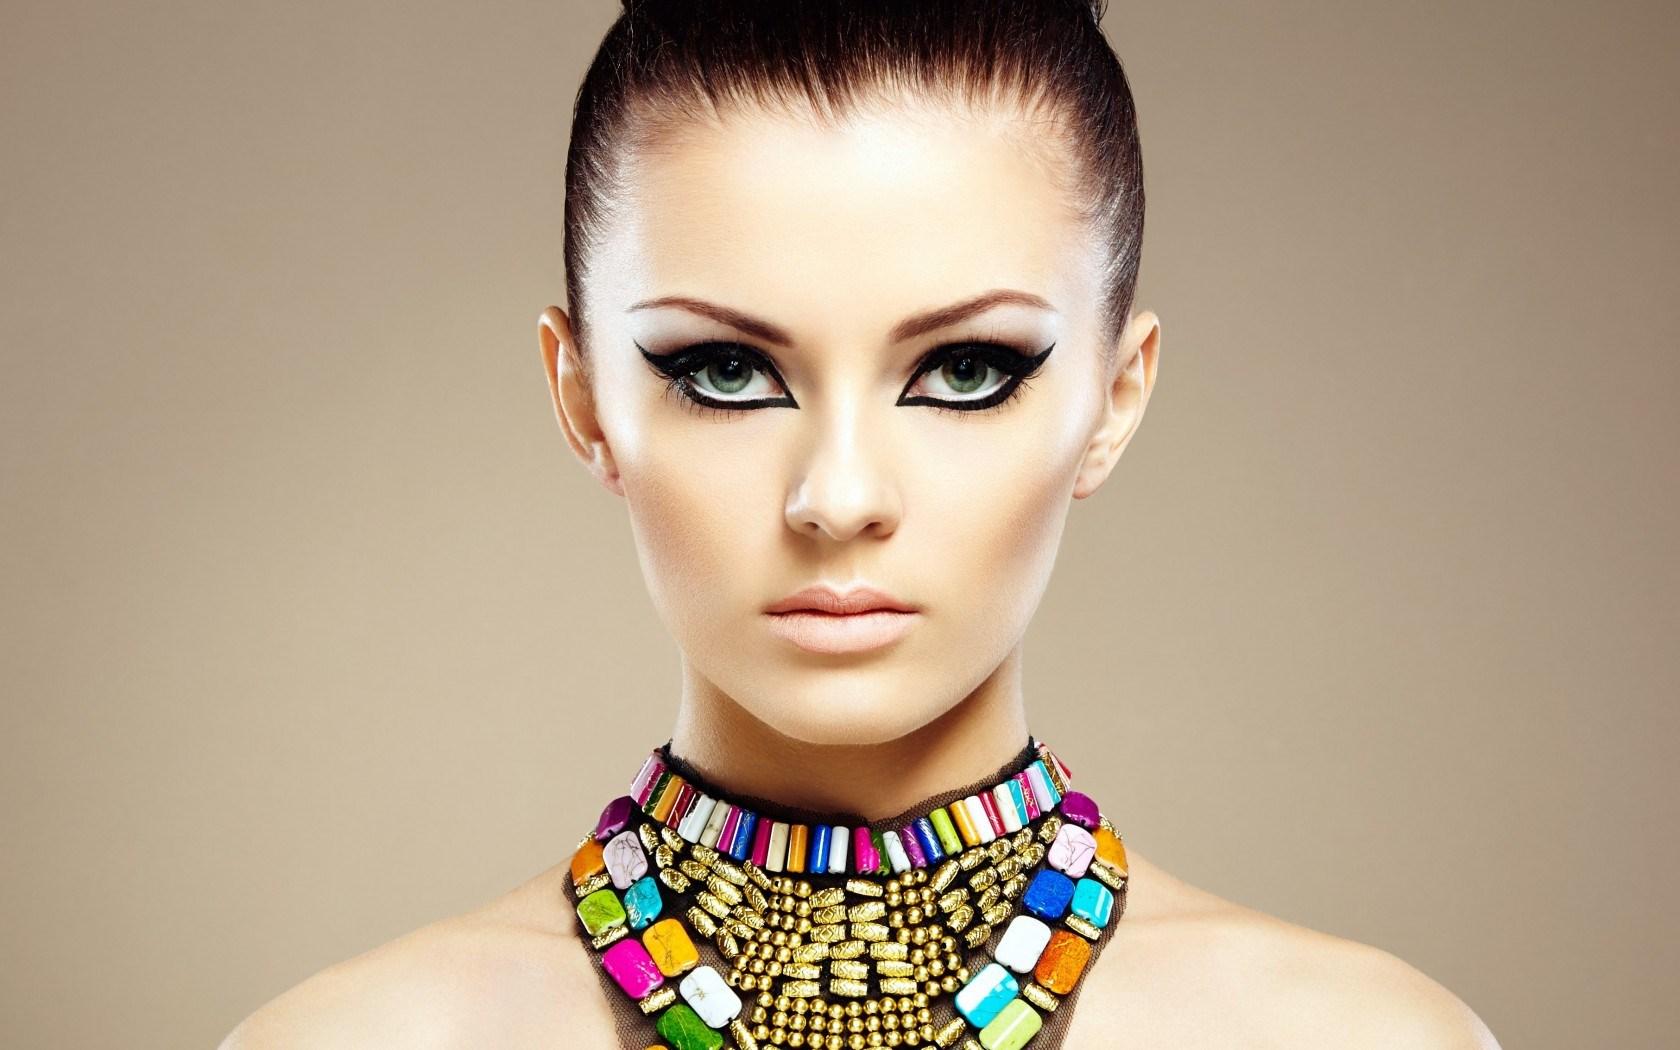 Beautiful Girl Makeup Wallpaper 1680x1050 18612